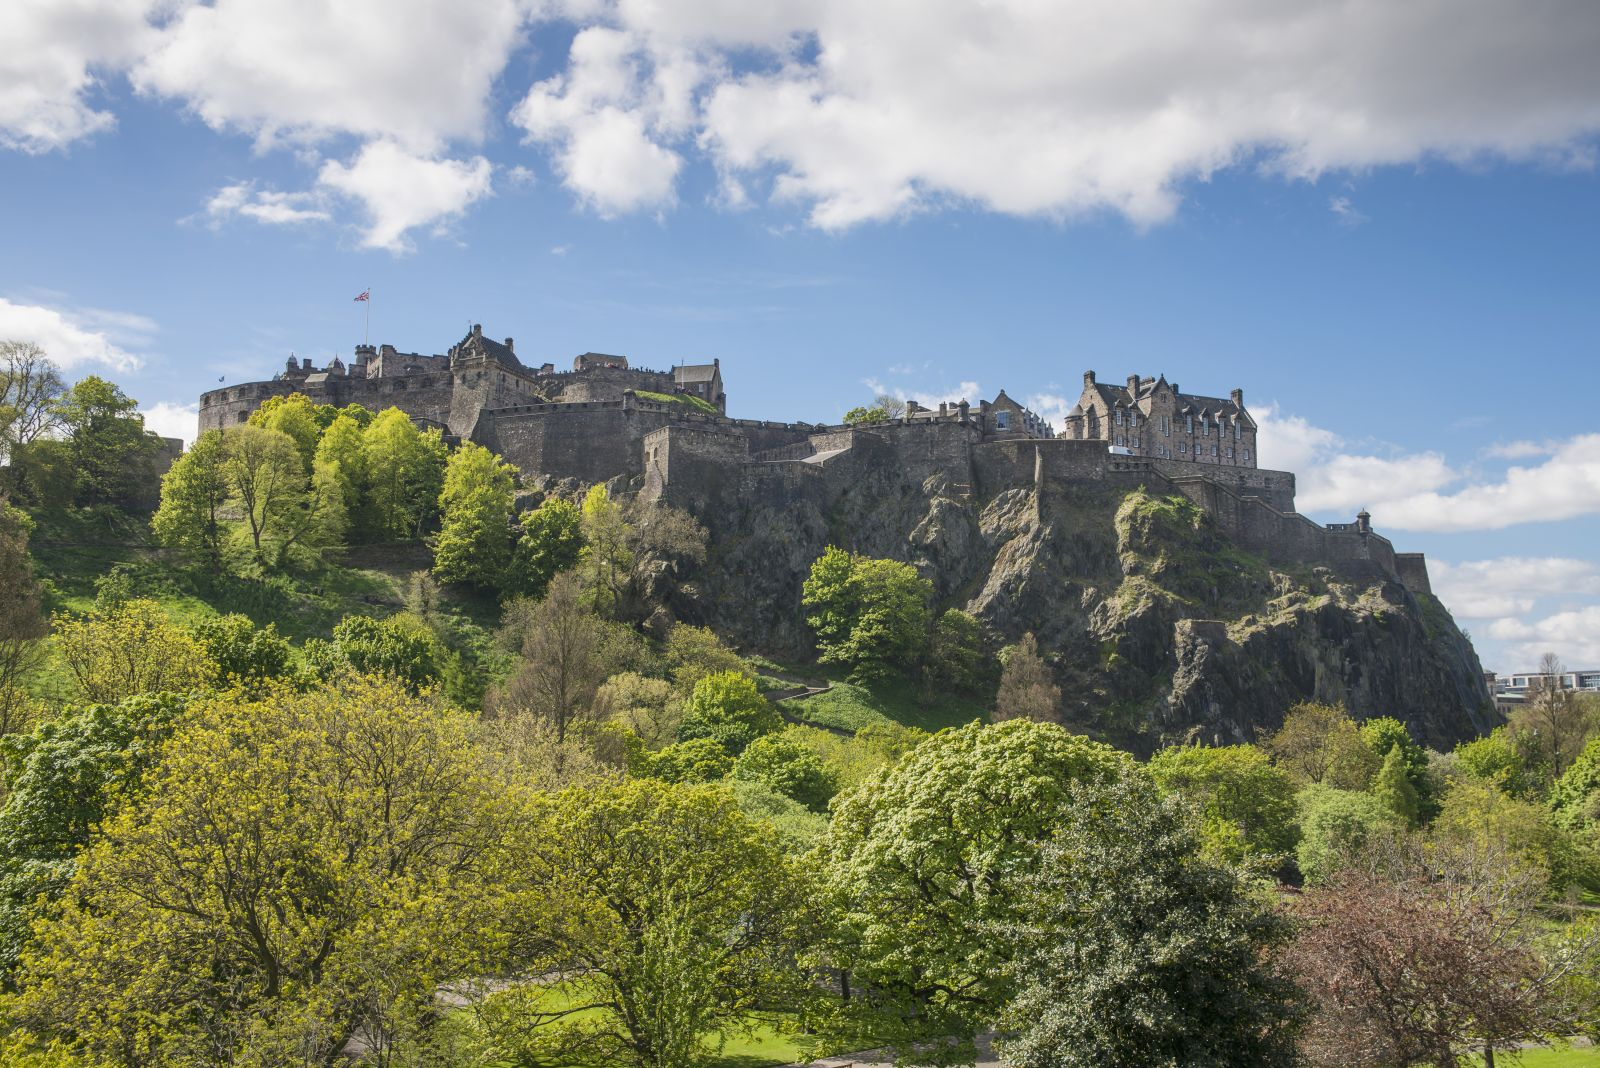 Explore Edinburgh in Scotland with Luxury Scotland experts Sandgrouse Travel